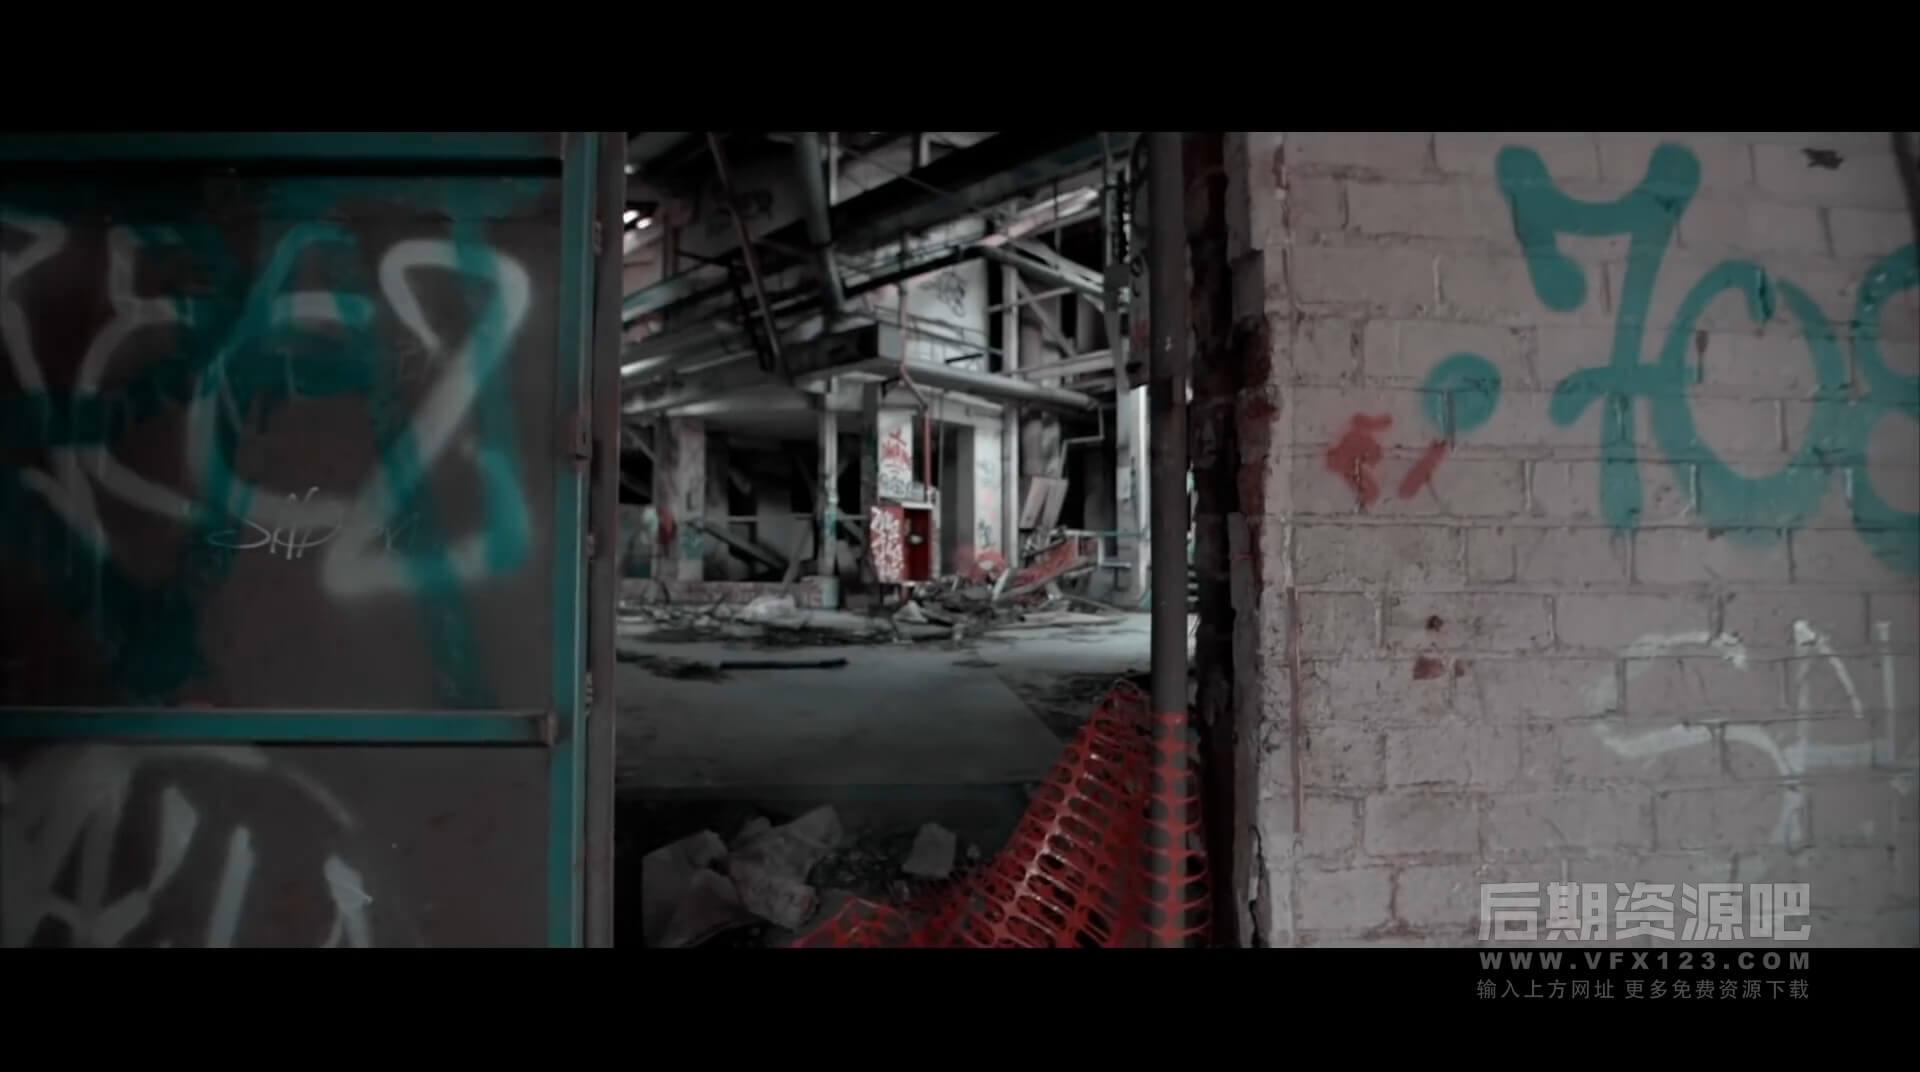 fcpx转场插件 12组快速模糊过渡转场预设 完整版 Quick Blur Transitions